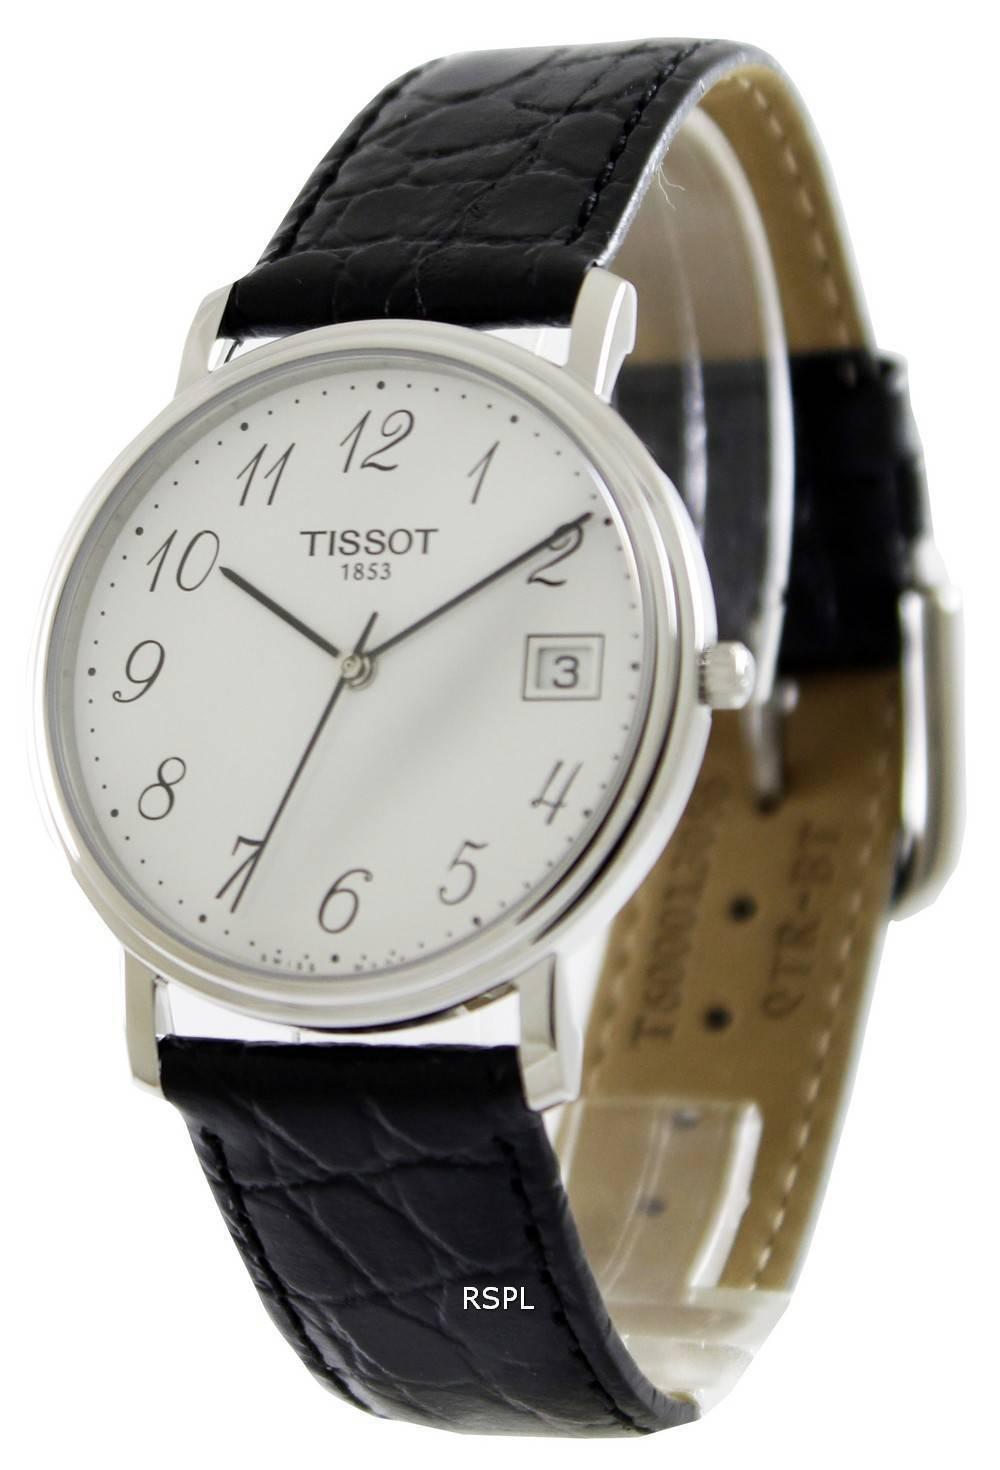 Tissot T-Classic Desire T52.1.421.12 Mens Watch Singapore 02042953b75